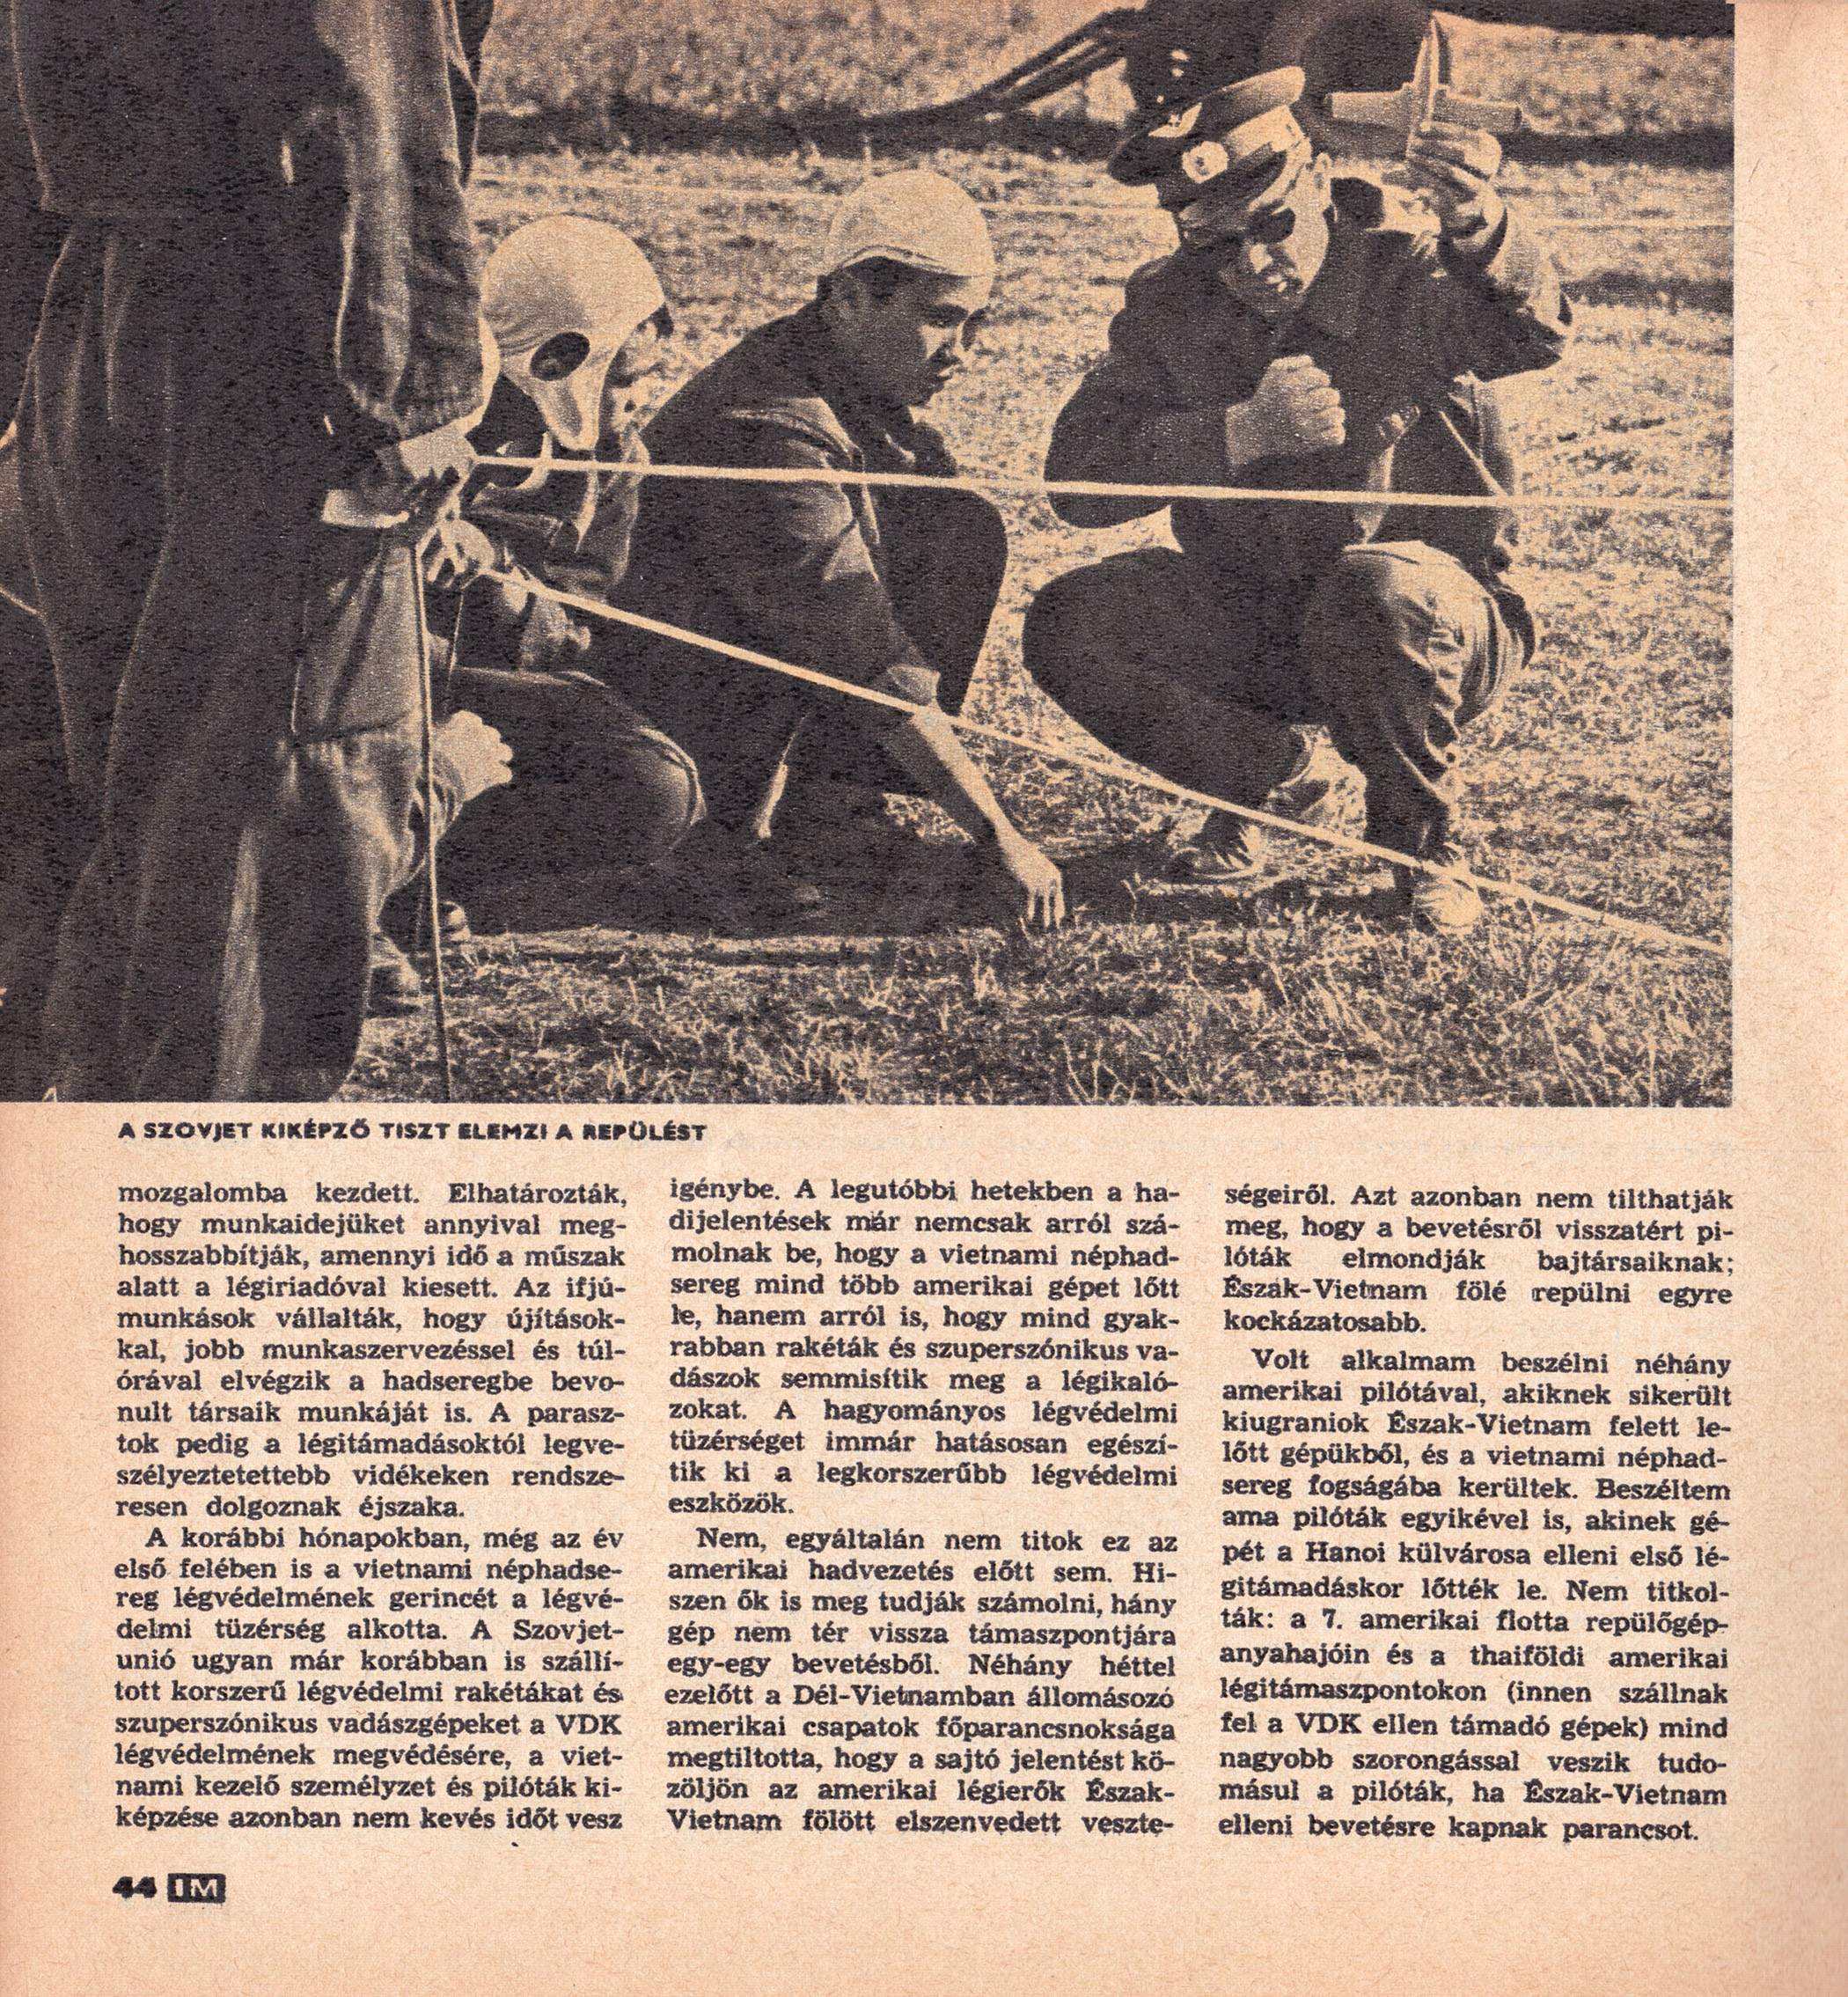 im-cikk-196612_amit_nem_lehet_titkolni_3-.jpg